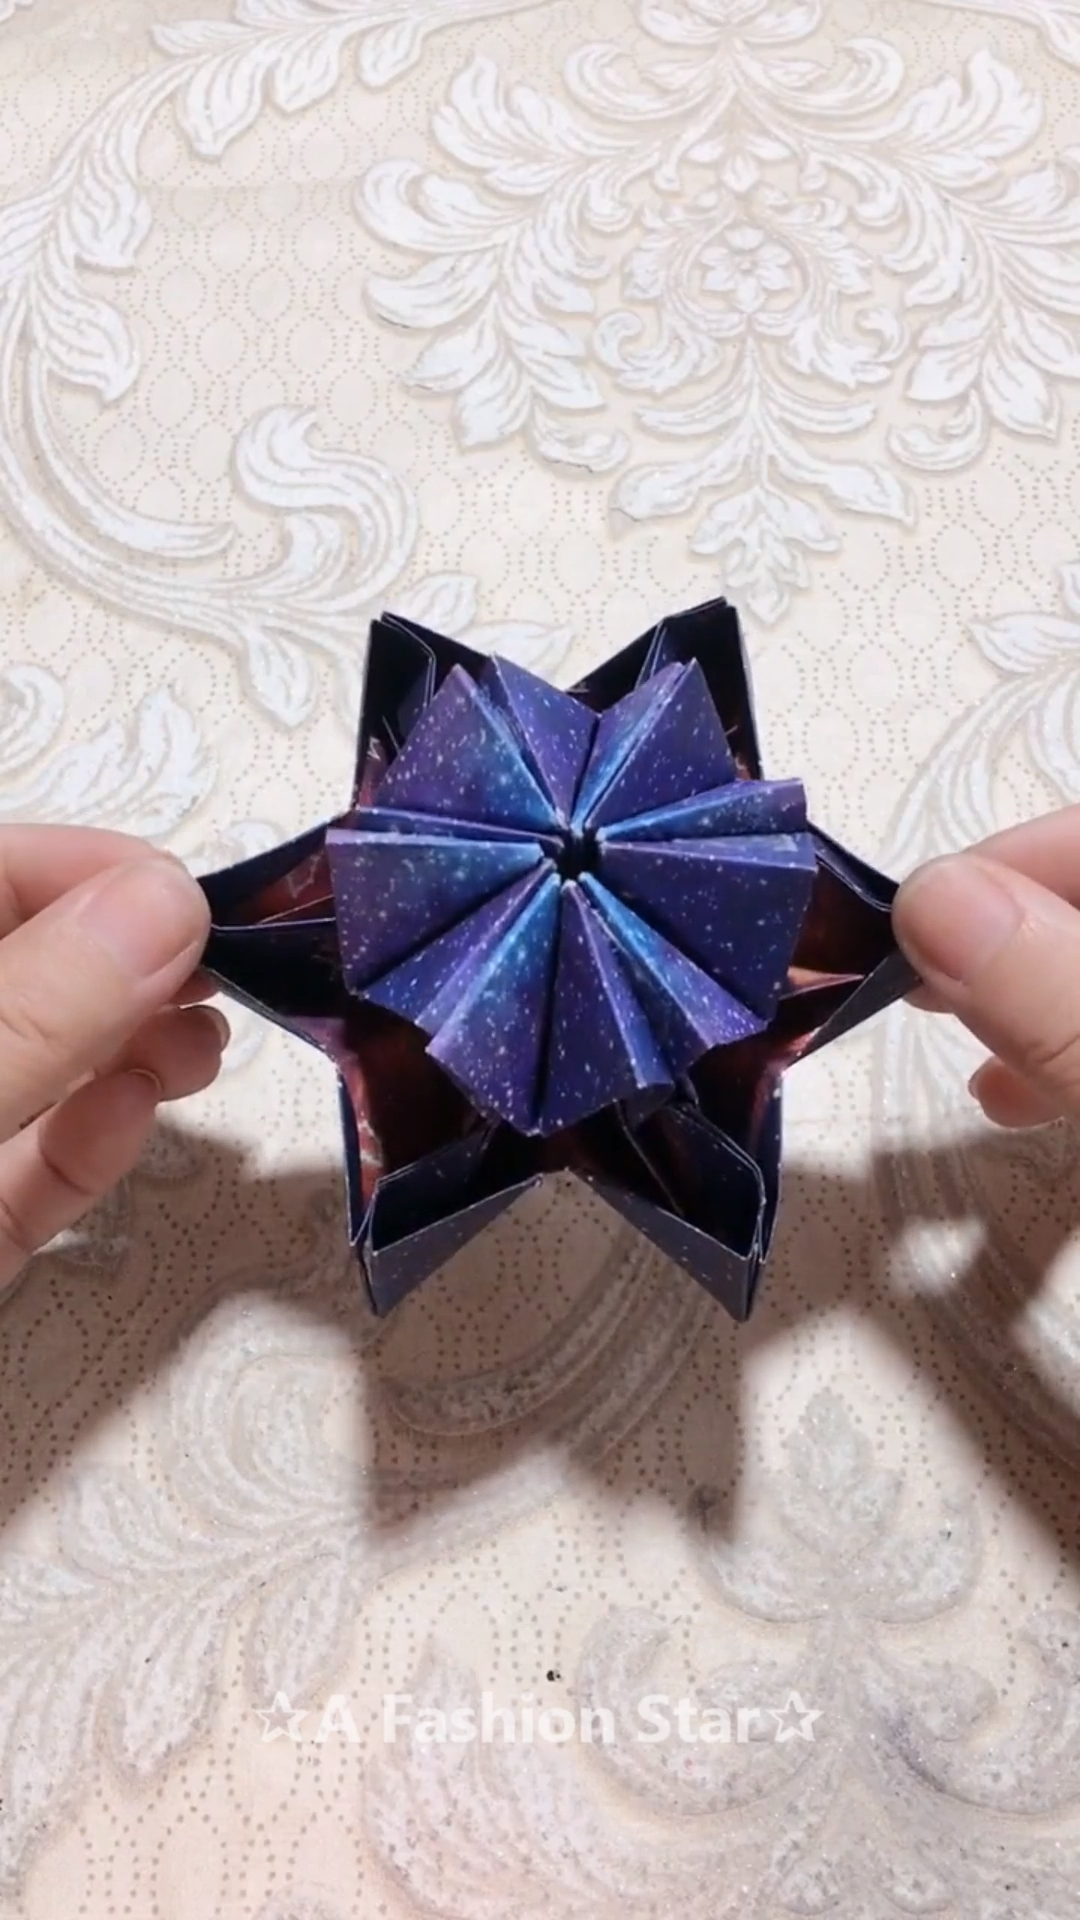 Variety Stars Paper DIY ✰A Fashion Star✰  diy paper arts and crafts - Diy Paper Crafts #Paper #Stars #DiyPaperCrafts